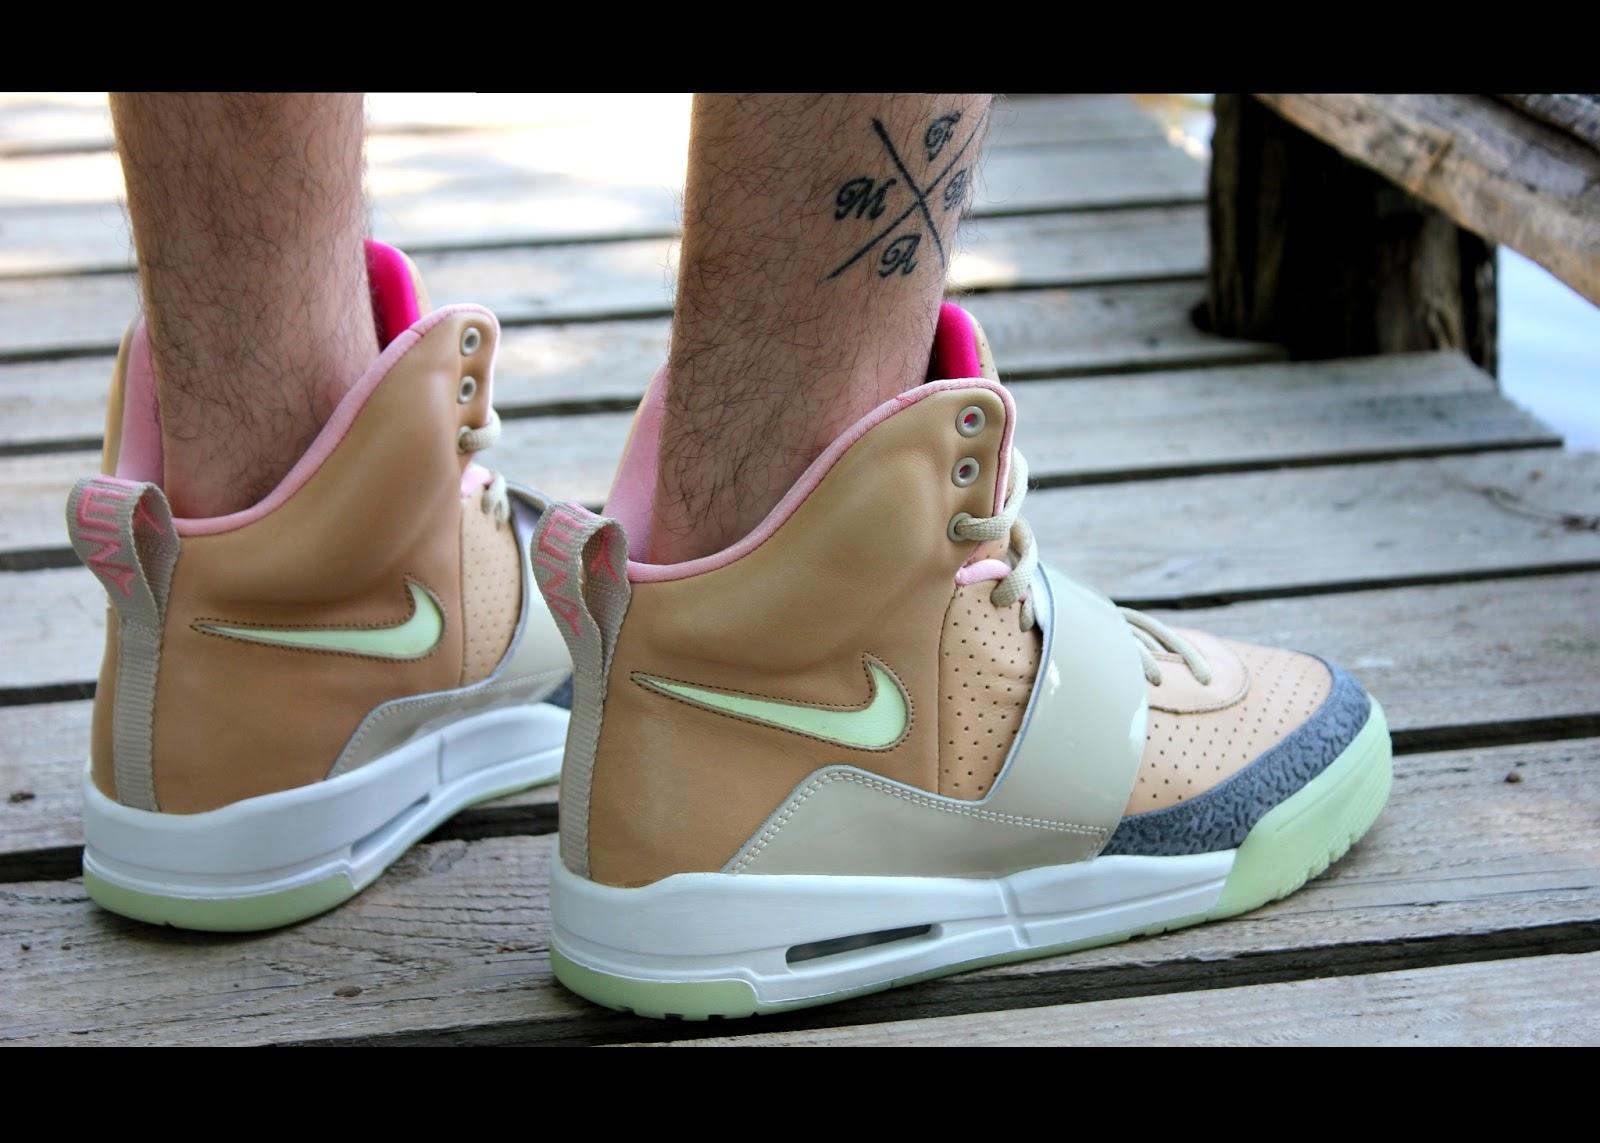 My Kicks Collection: Nike Air Yeezy 1 Tan